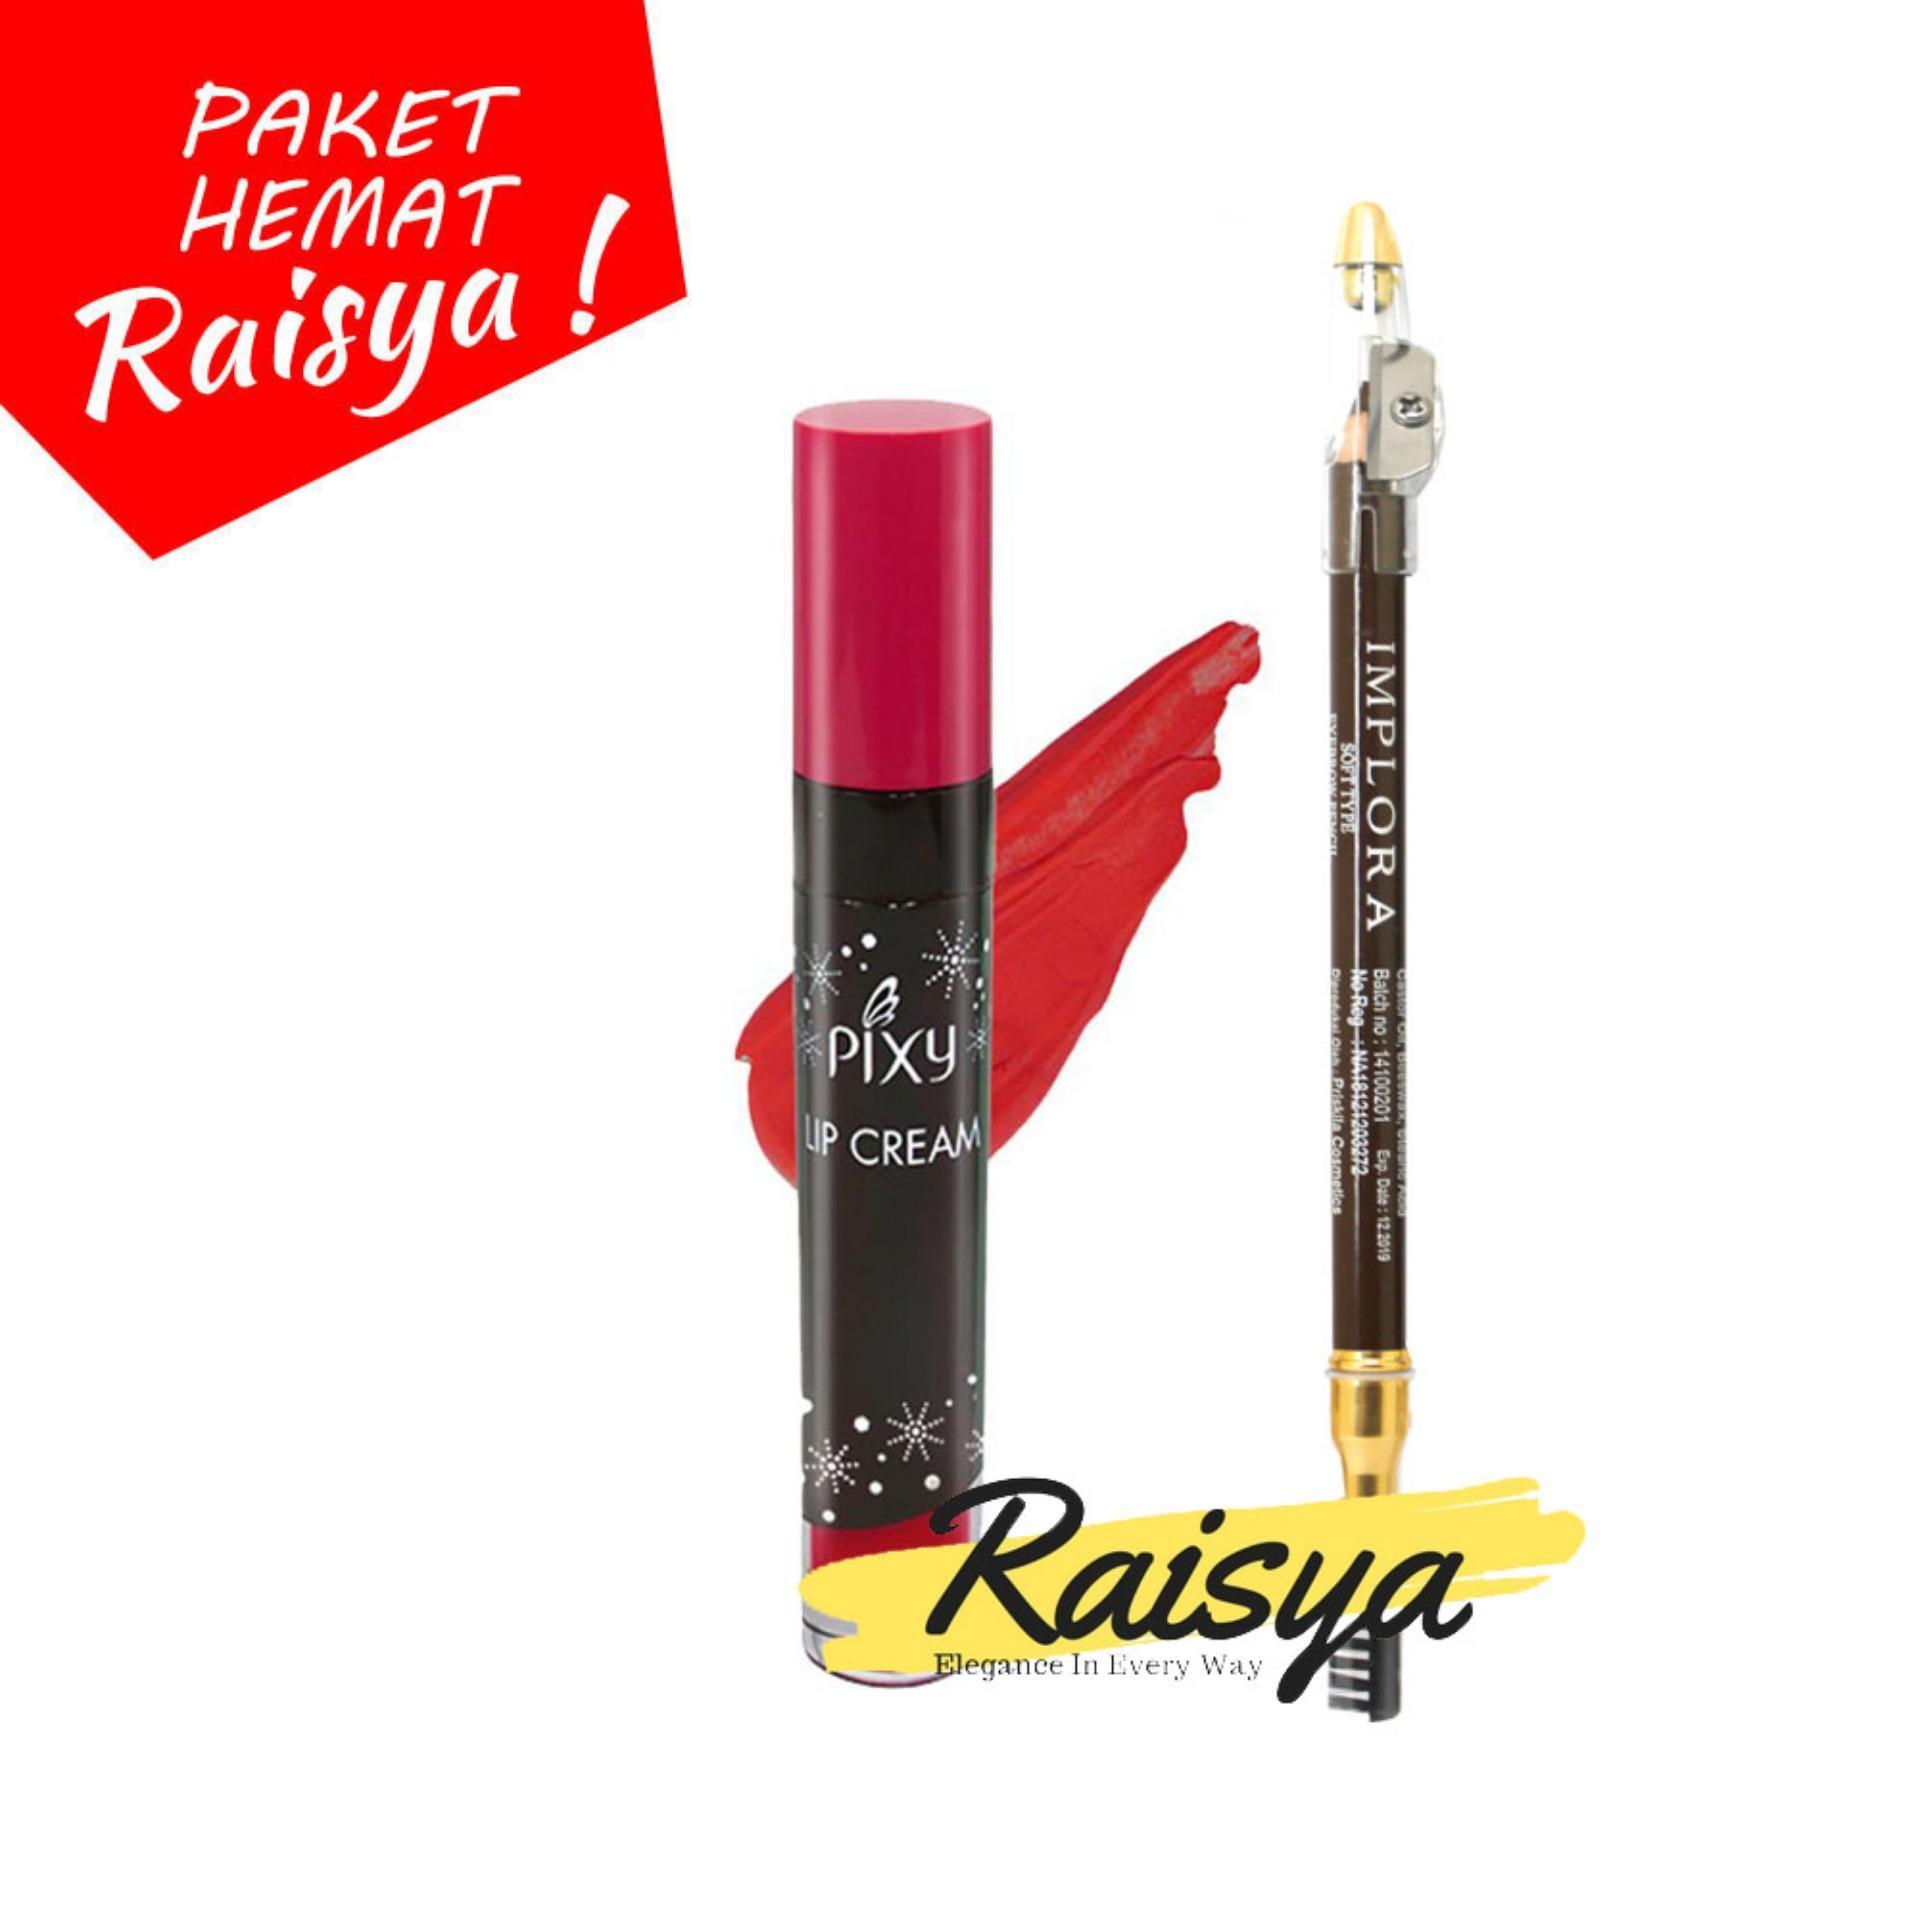 Pixy Lip Cream No. 02 Party Red Free Implora Pensil Alis Coklat Resmi BPOM